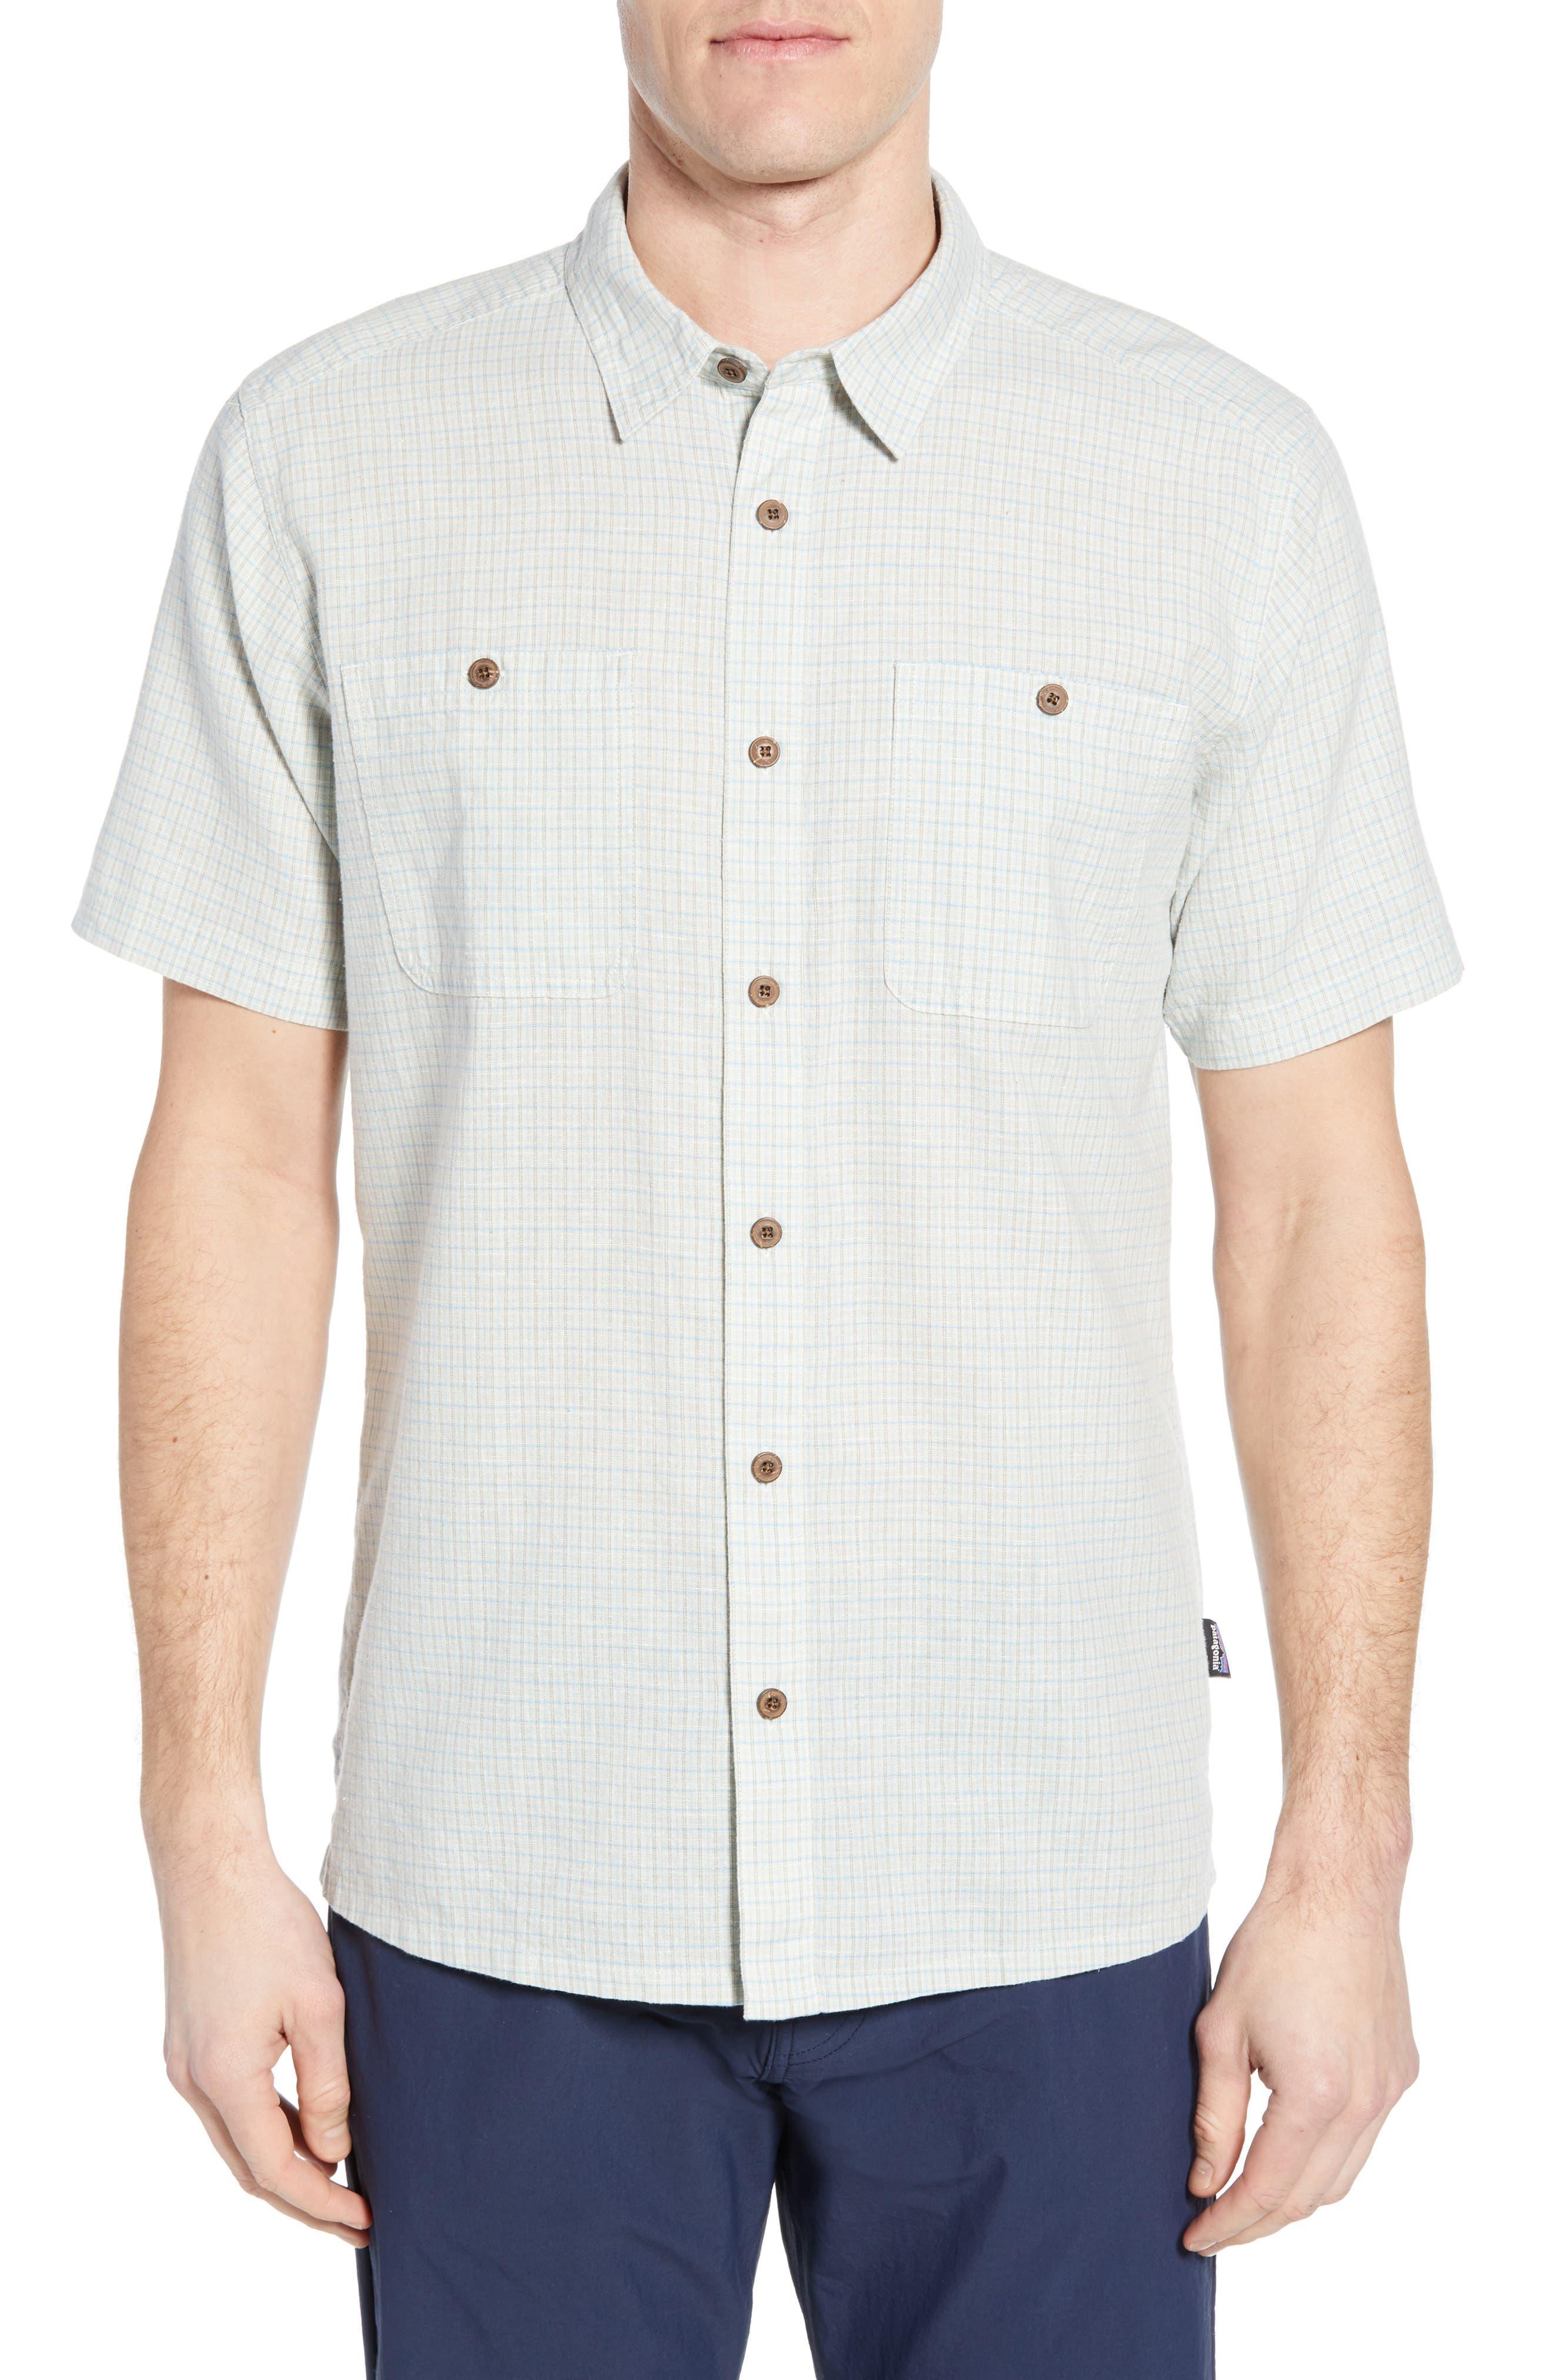 Patagonia Back Step Regular Fit Short Sleeve Sport Shirt, Grey